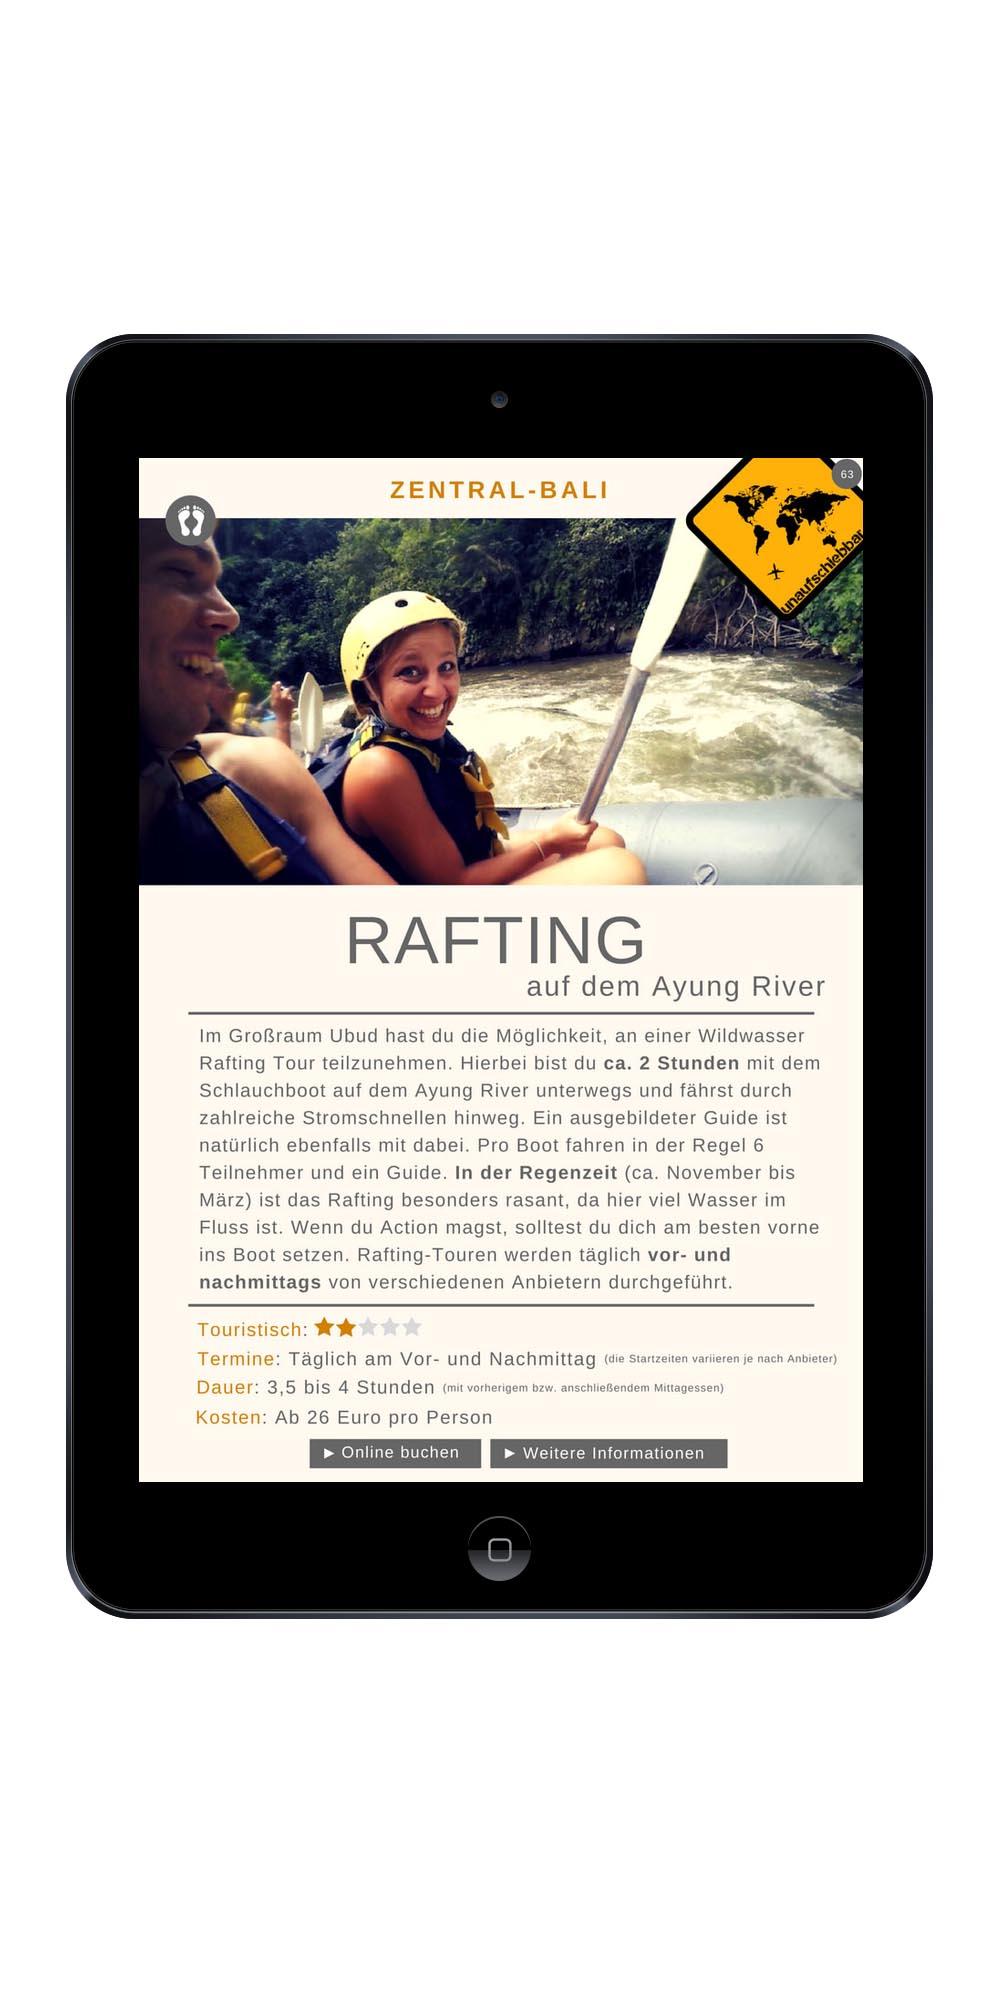 222 Lombok & Bali Highlights - 55 Wildwasser Rafting